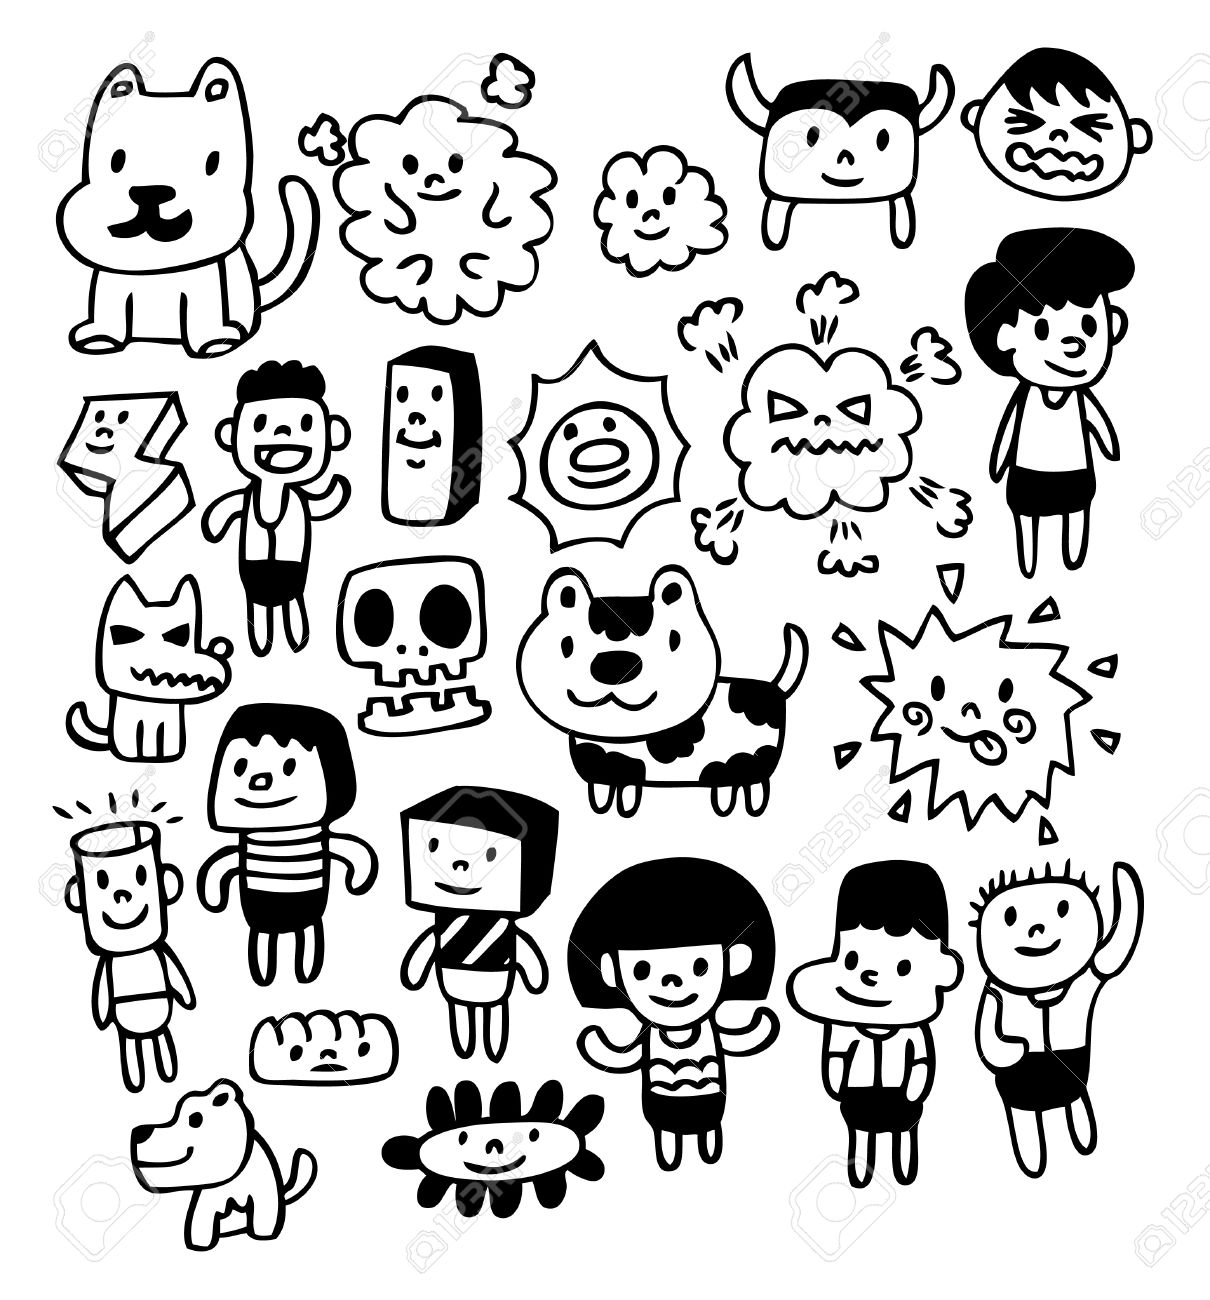 1210x1300 Drawn Cute Doodle